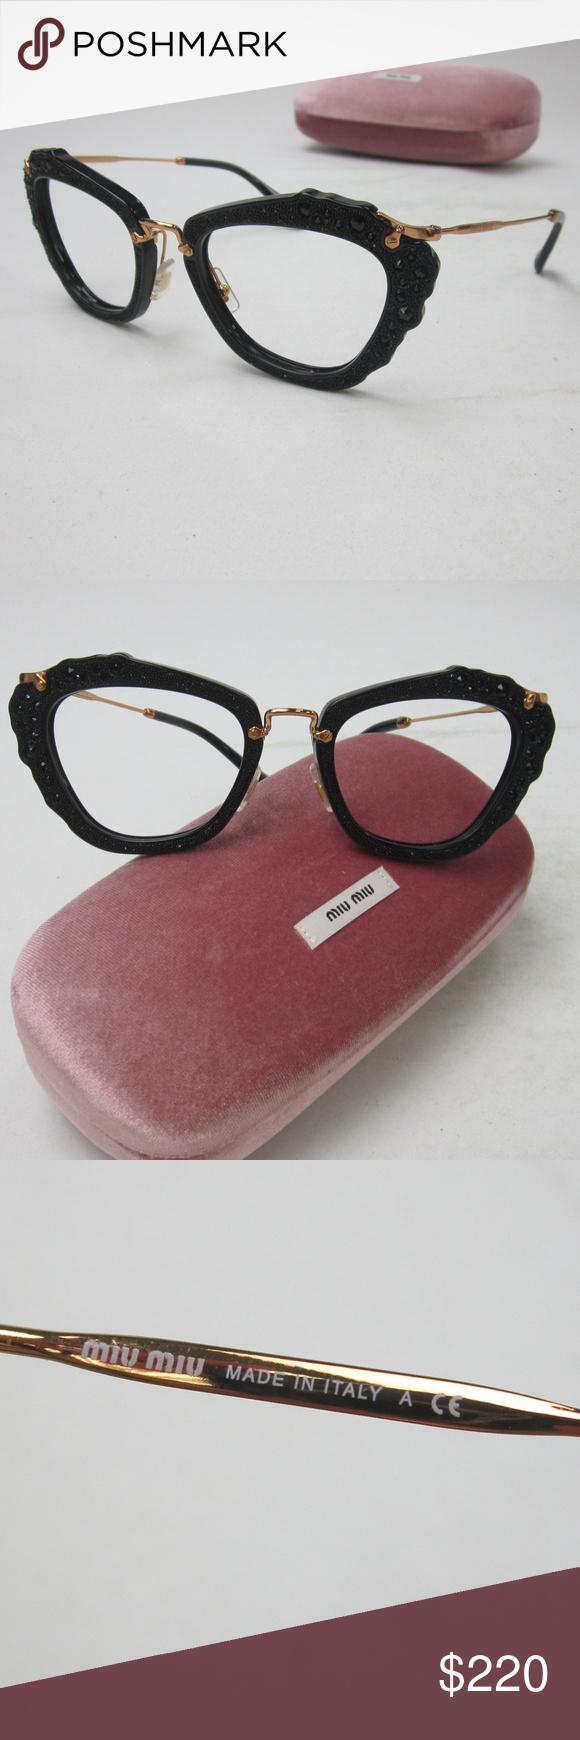 ea93c7b514de Frame Only Miu Miu SMU 13N Sunglasses Italy OLN444 Frame Only Miu Miu SMU